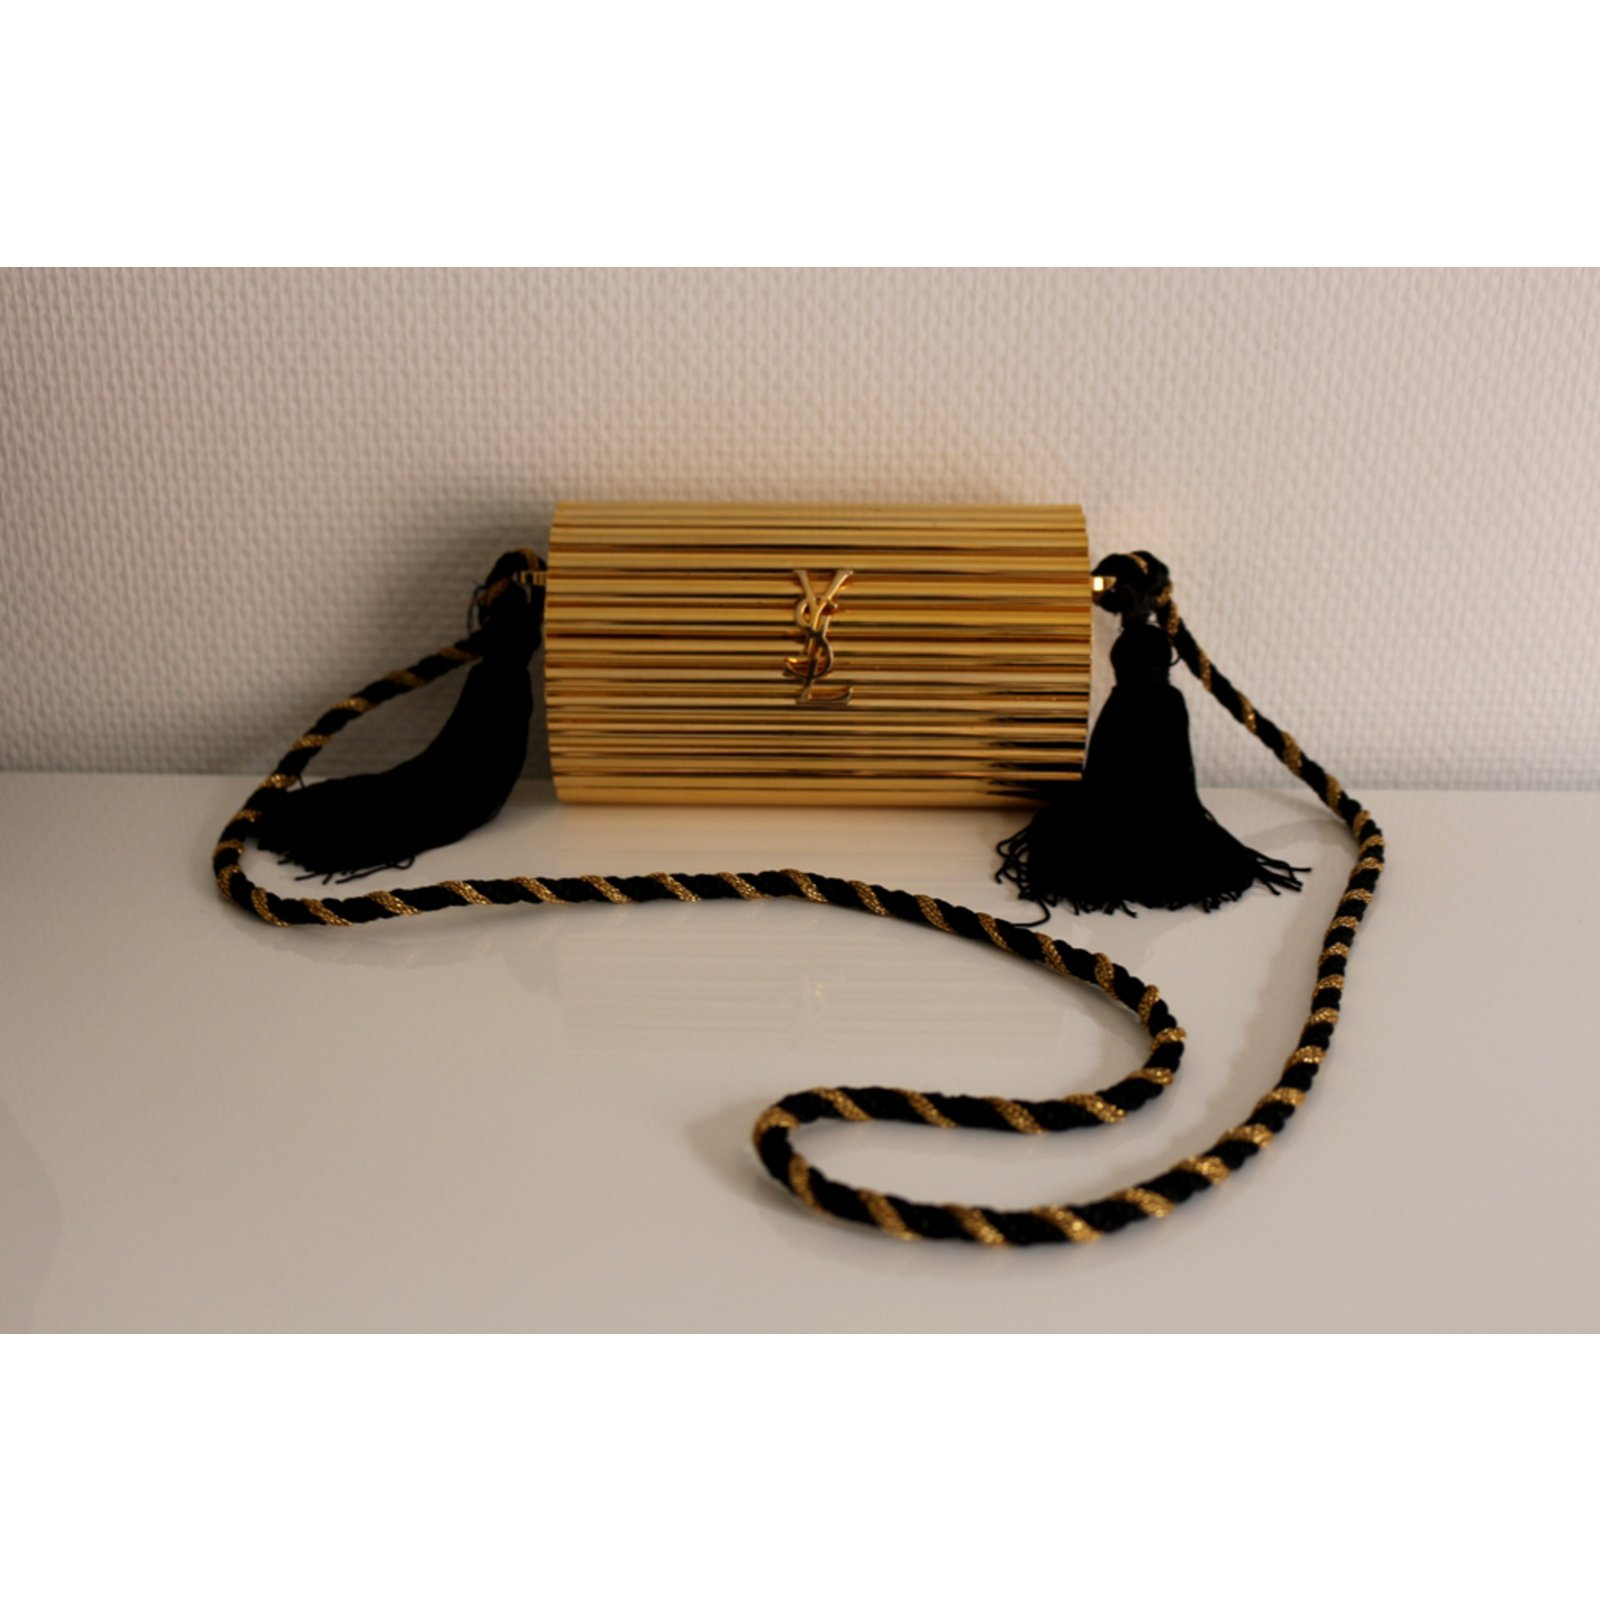 e991f7eb86c92 Yves Saint Laurent Bag Handbags Plastic Golden ref.74739 - Joli Closet